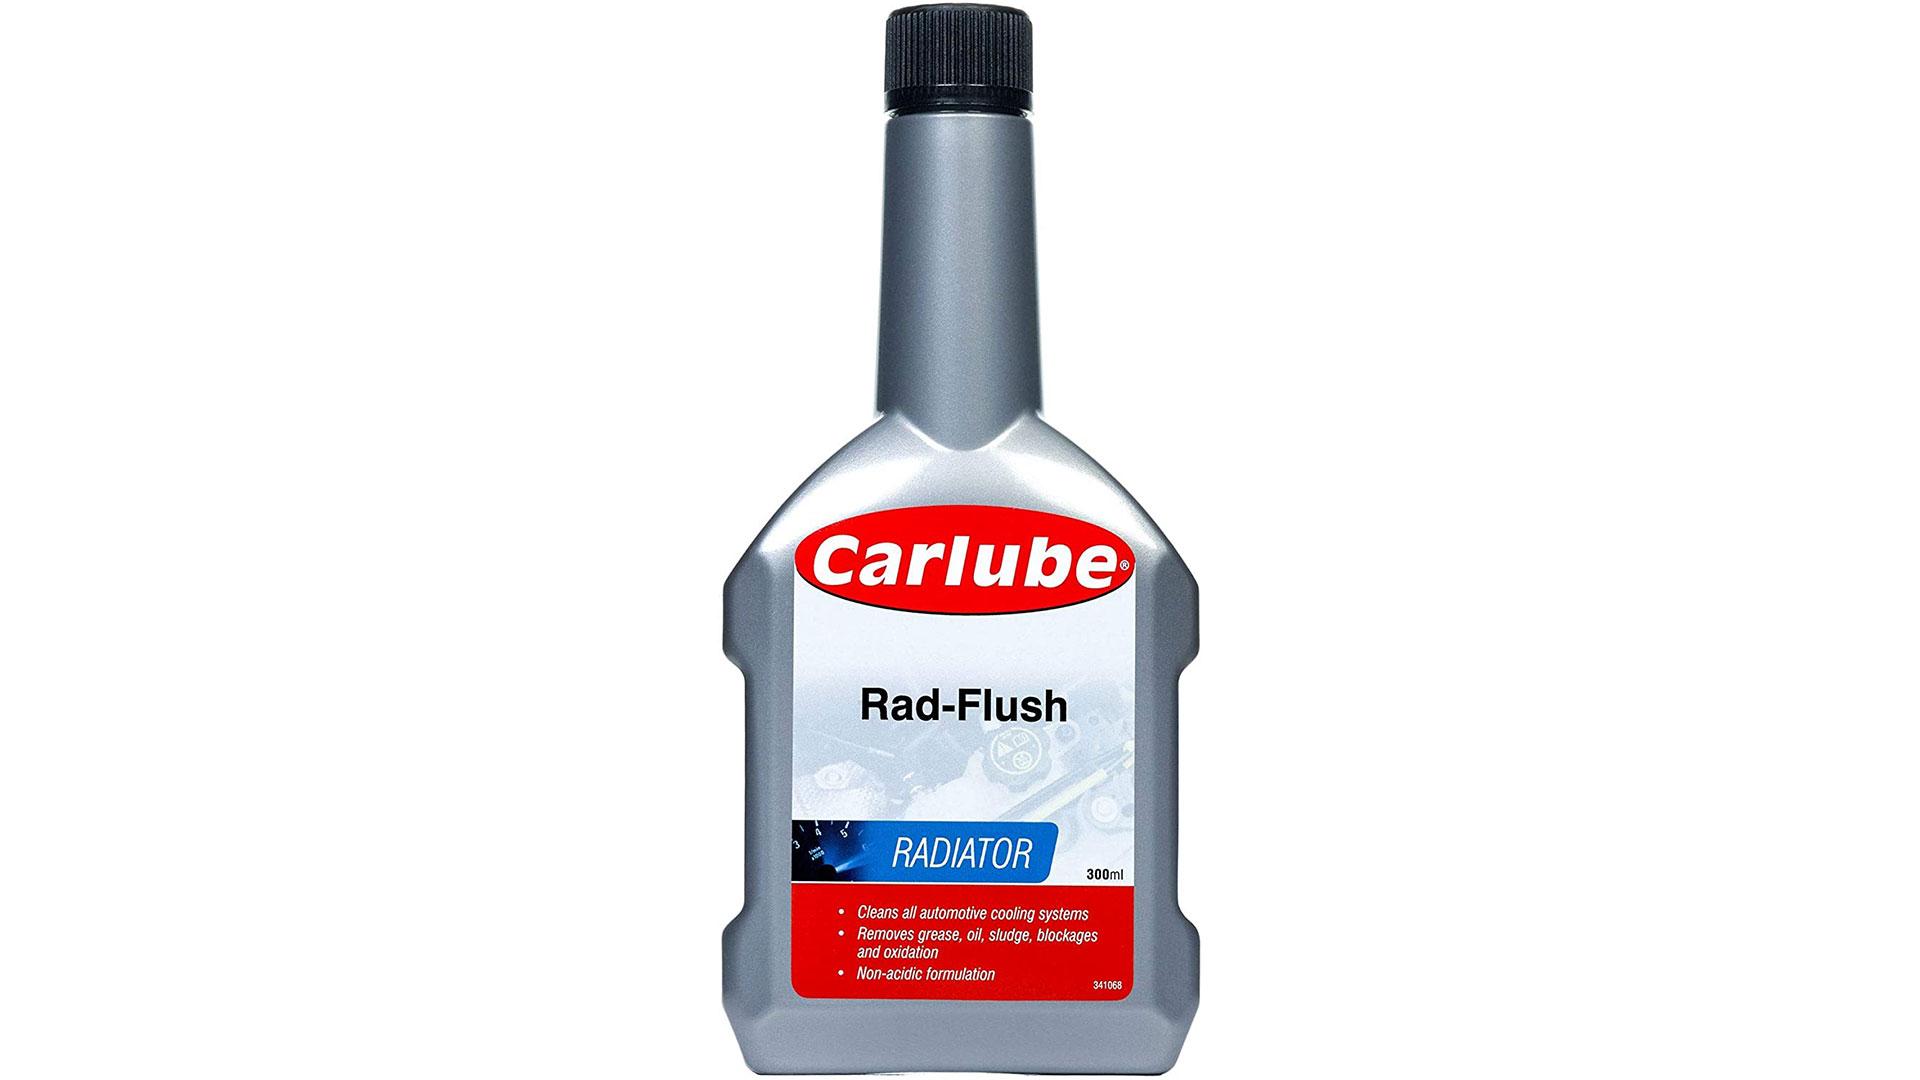 car lube radiator flush